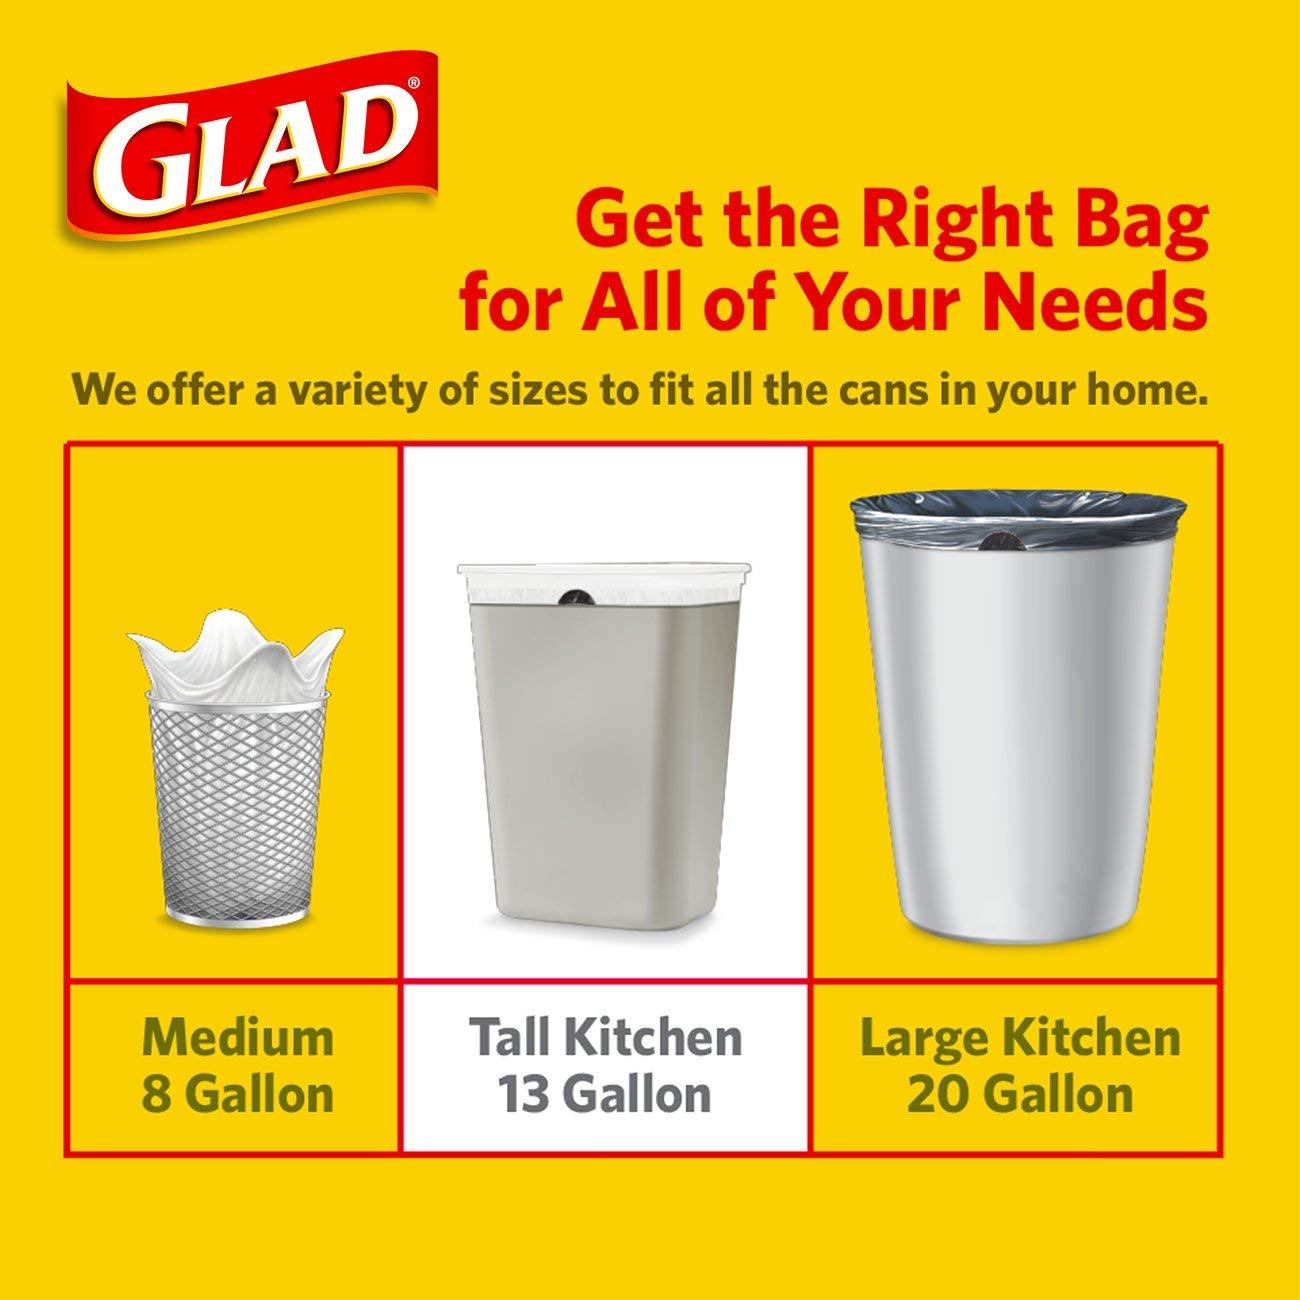 13 gallon kitchen trash can small island ideas with seating 佳能 glad 加长型穿绳厨房垃圾袋 加仑 90 个 个护健康 亚马逊中国 13加仑厨房垃圾桶